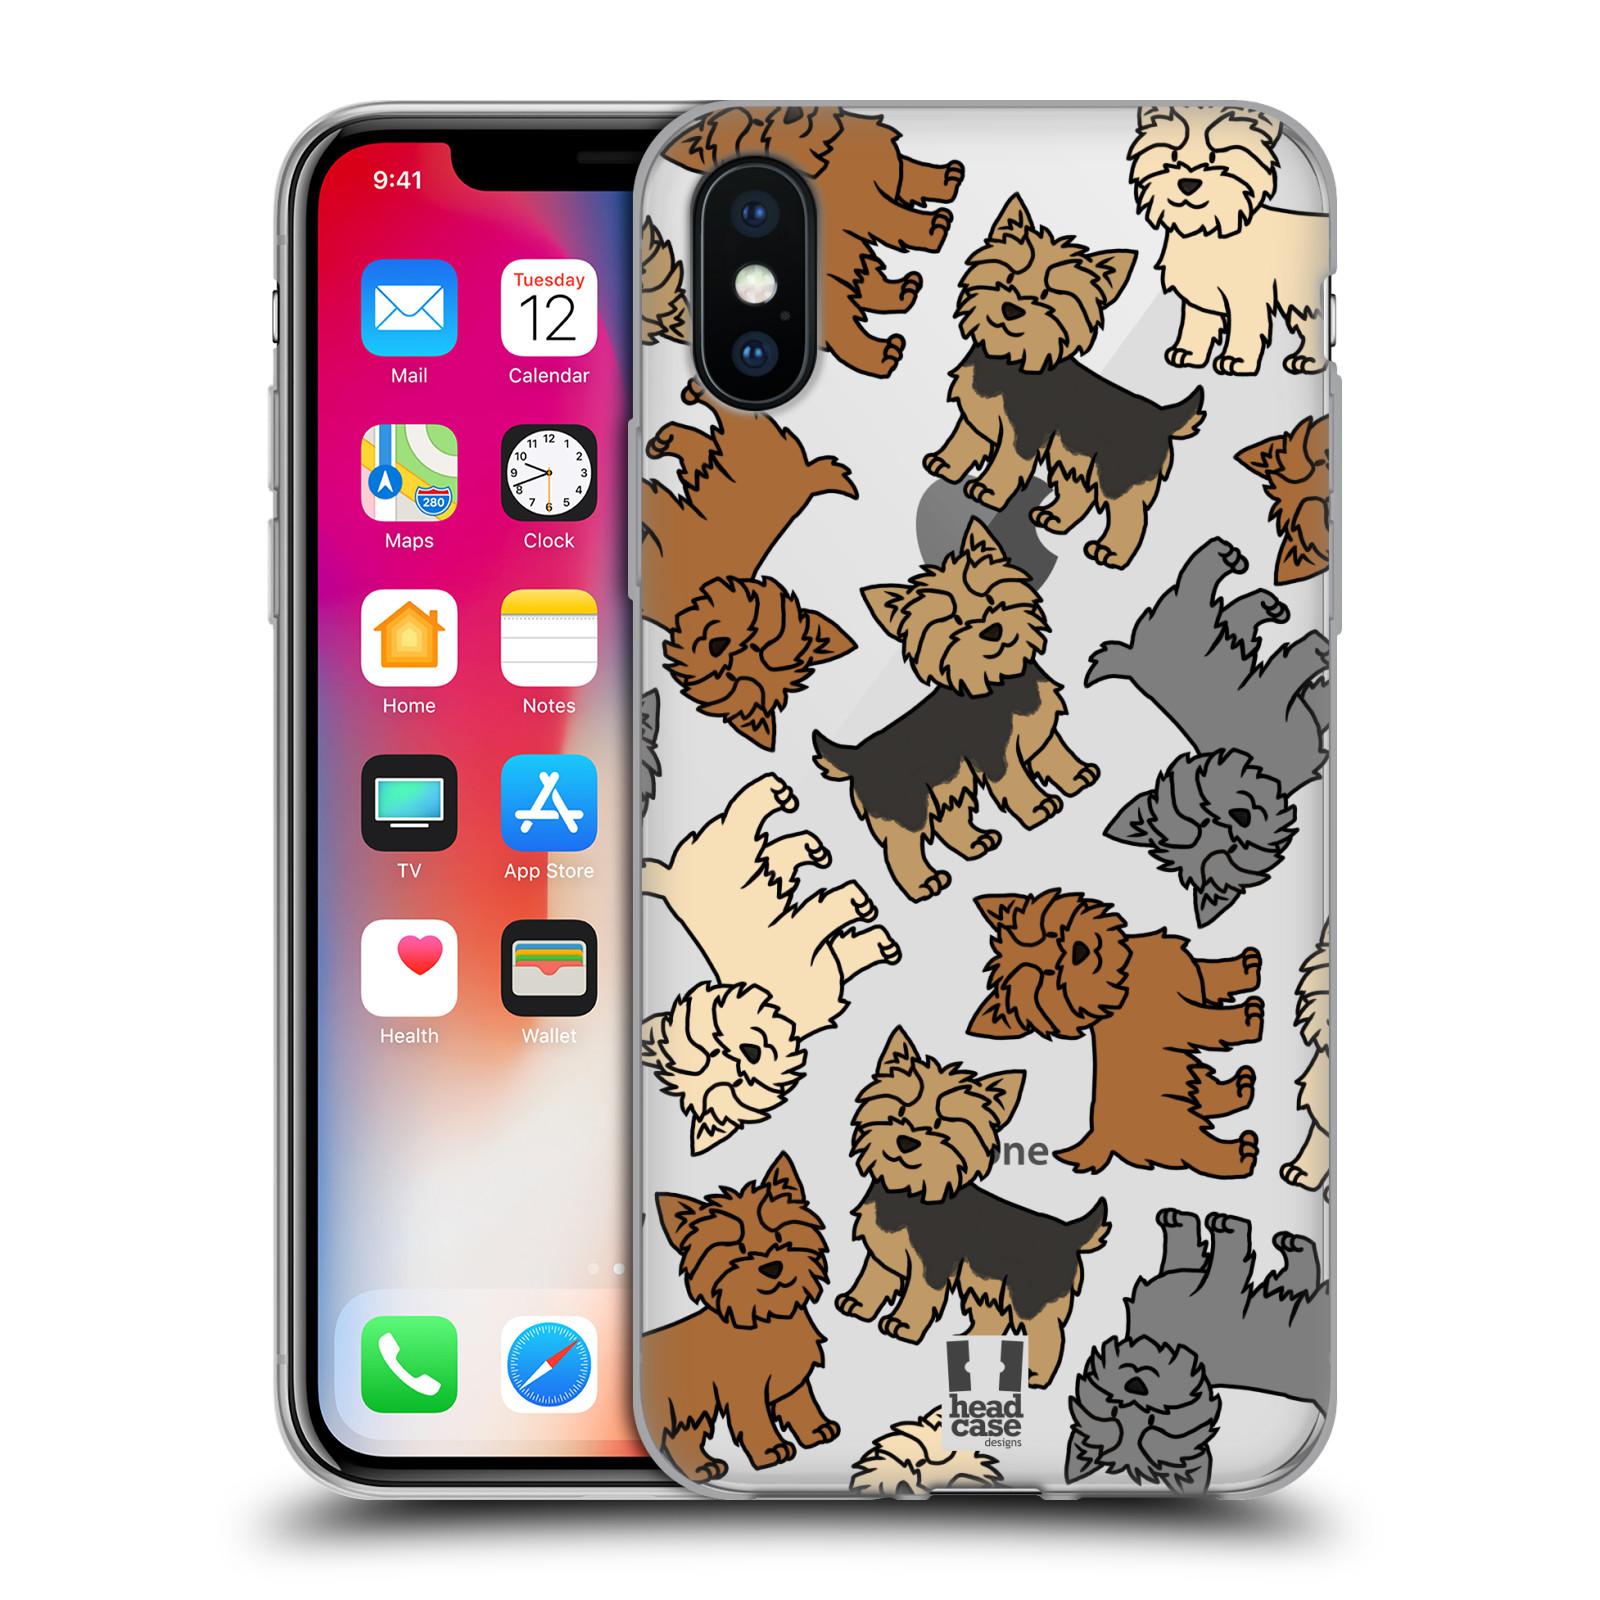 HEAD-CASE-DESIGNS-DOG-BREED-PATTERNS-12-SOFT-GEL-CASE-FOR-APPLE-iPHONE-PHONES